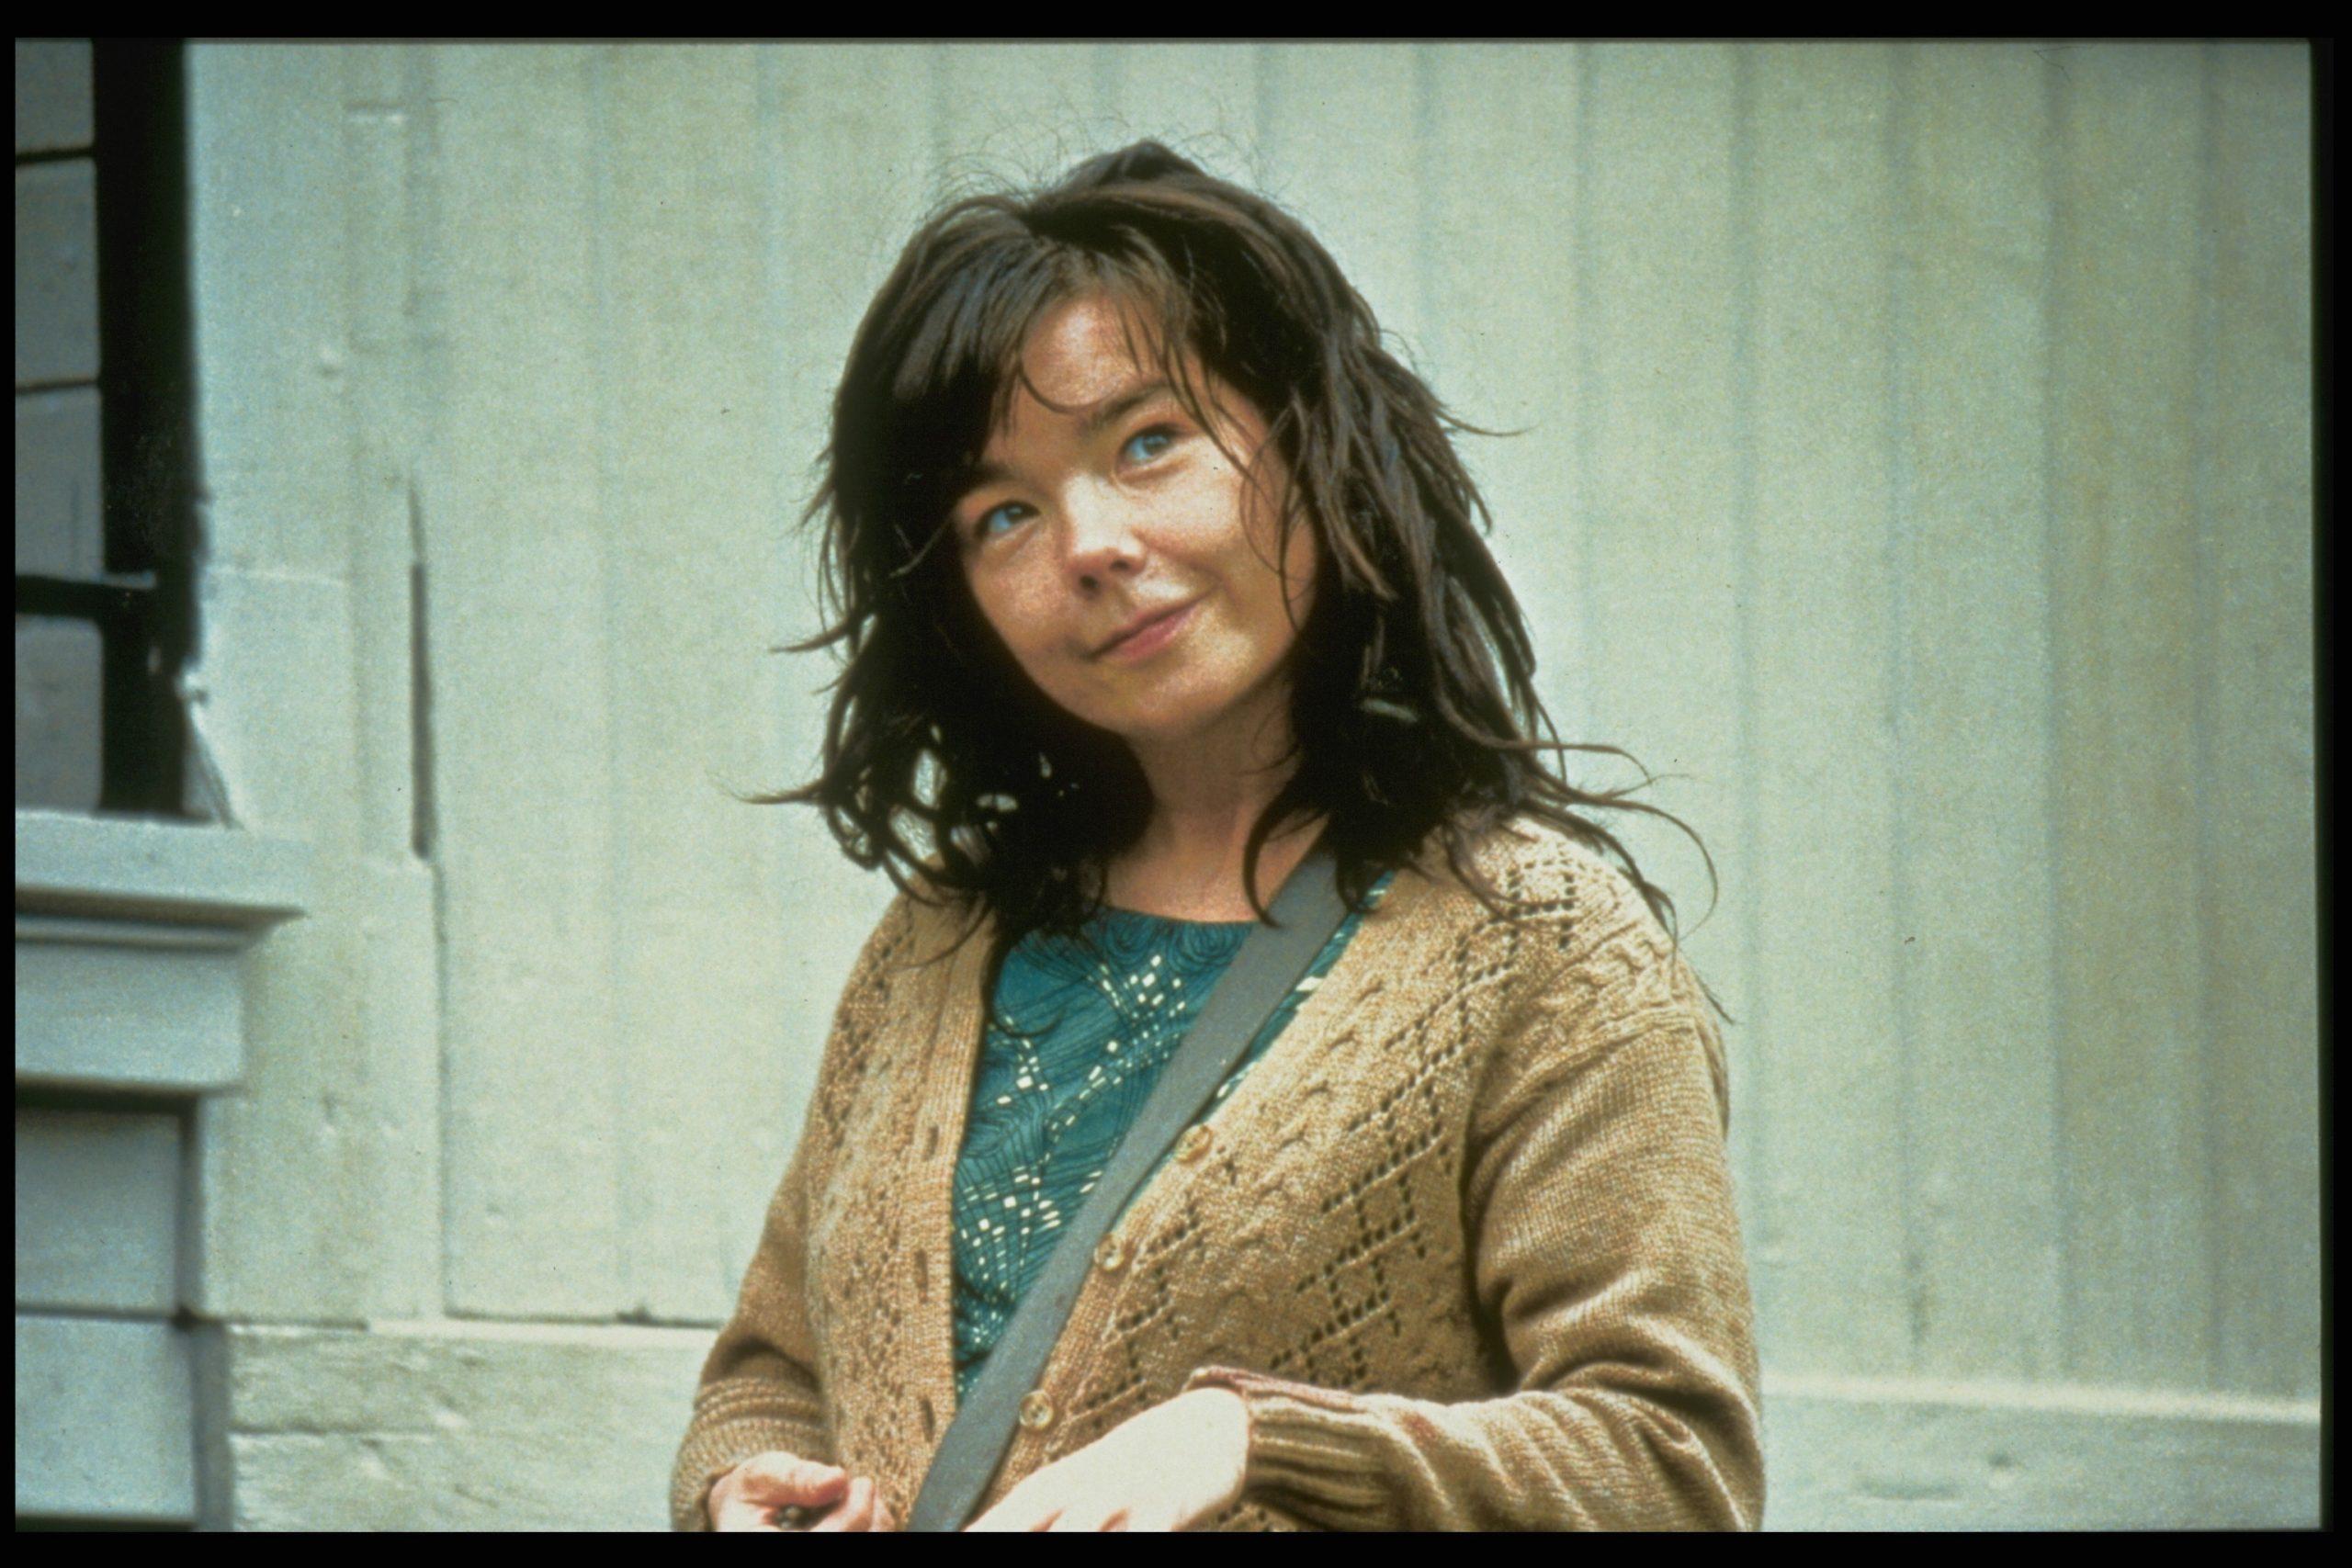 ¡Björk podría aparecer en la próxima película de Robert Eggers!